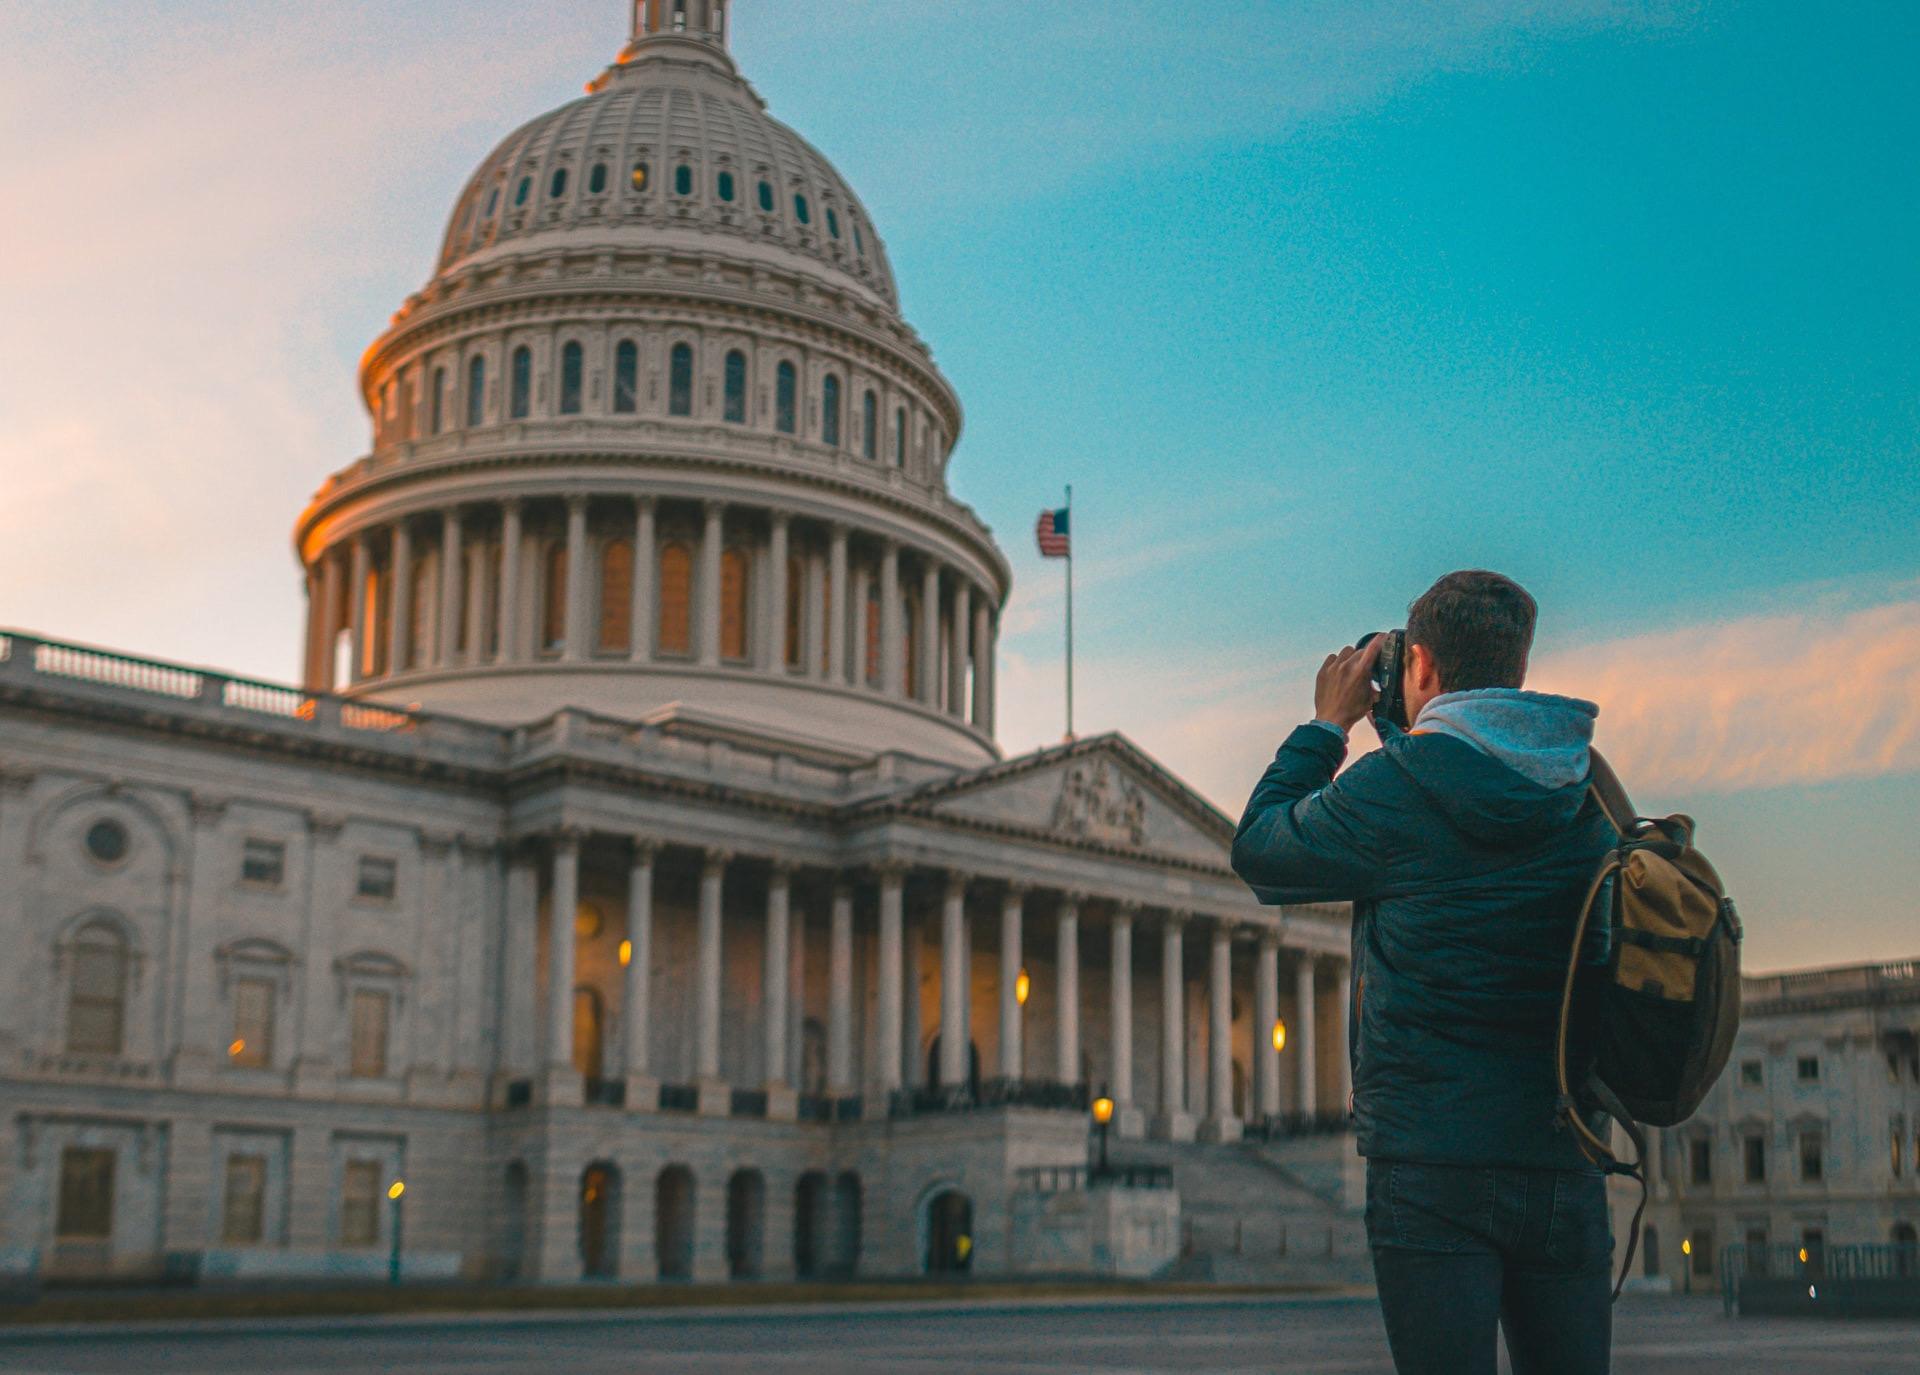 photographer taking scenic photo, best cameras for instagram